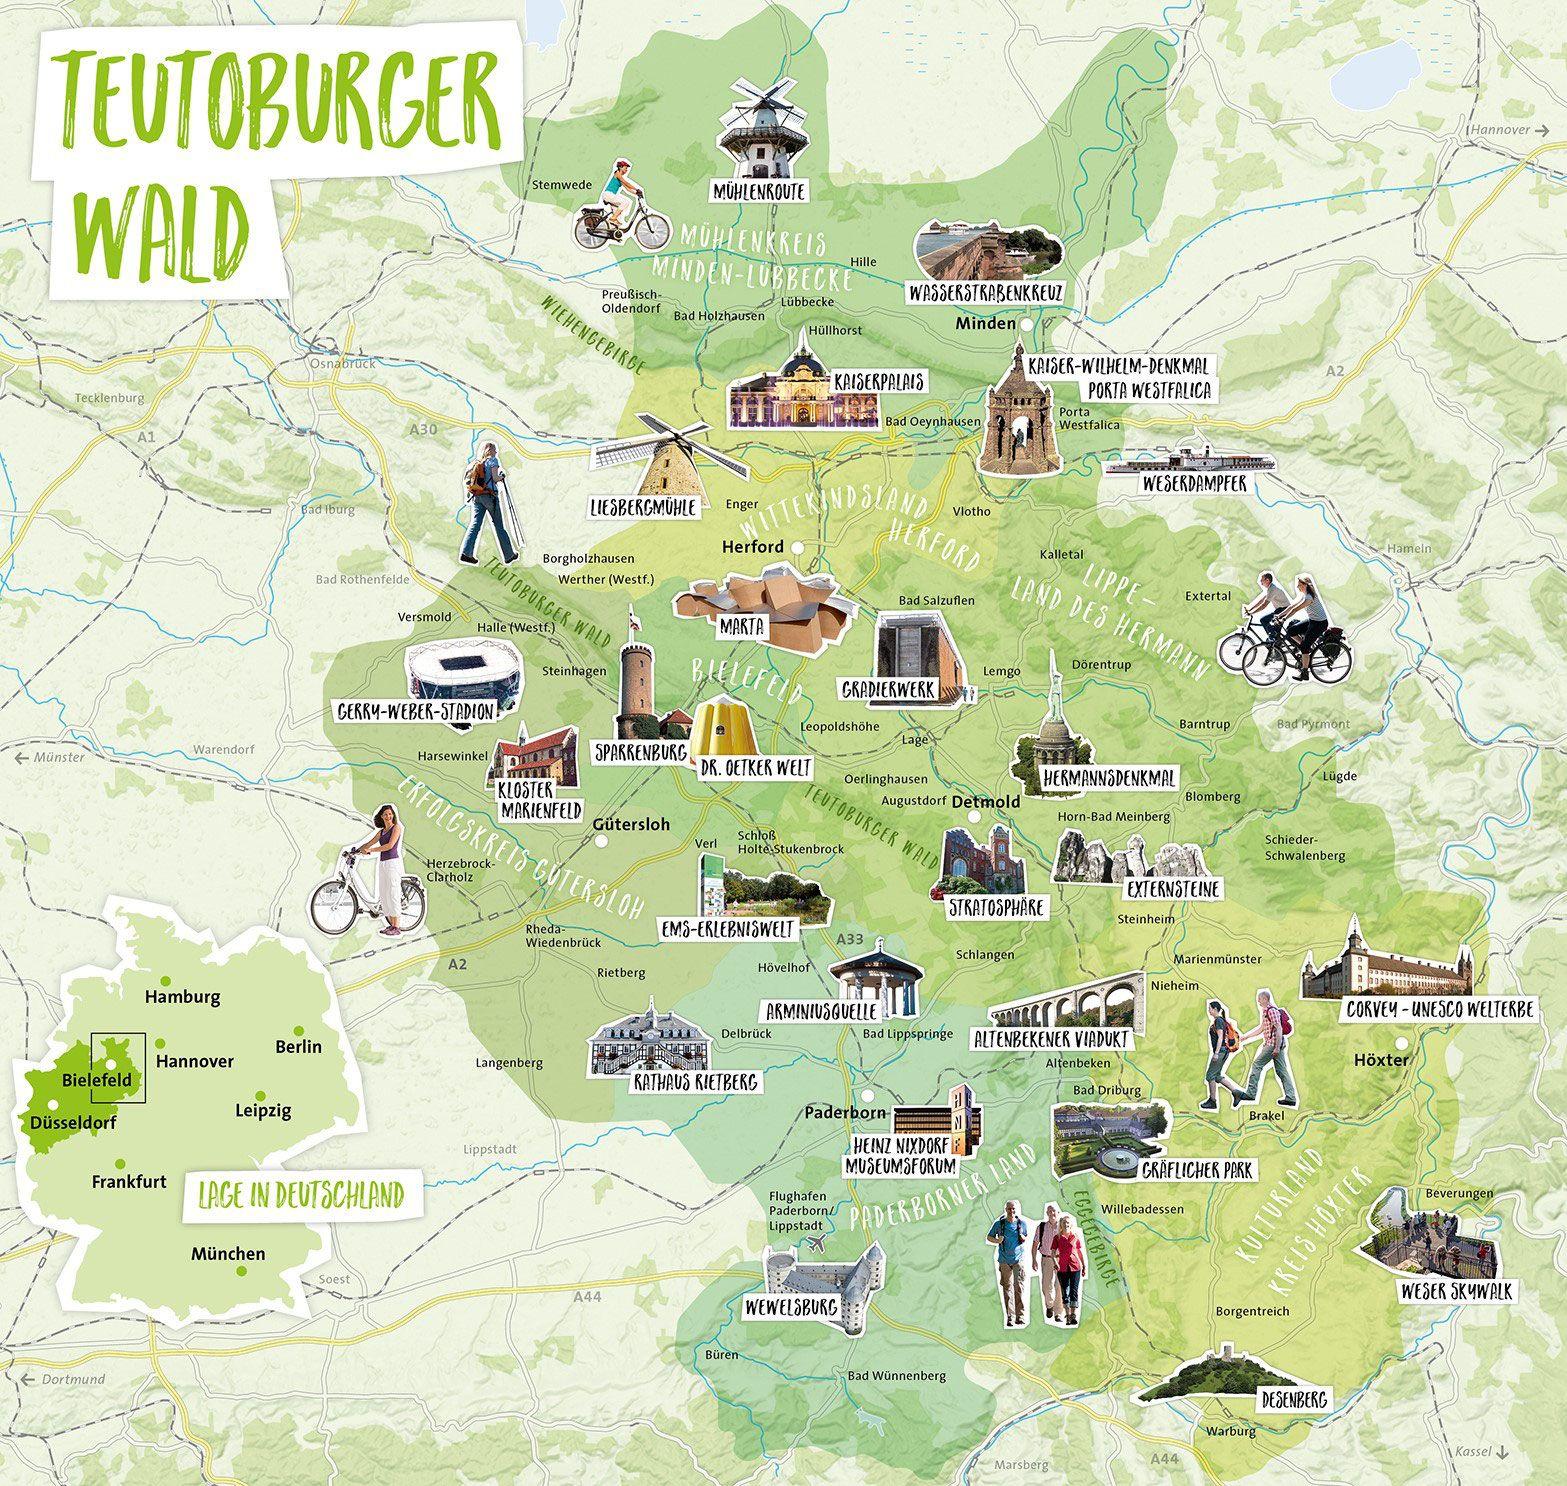 Wanderurlaub Wanderregion Teutoburger Wald Wanderurlaub Ausflug Nrw Urlaub